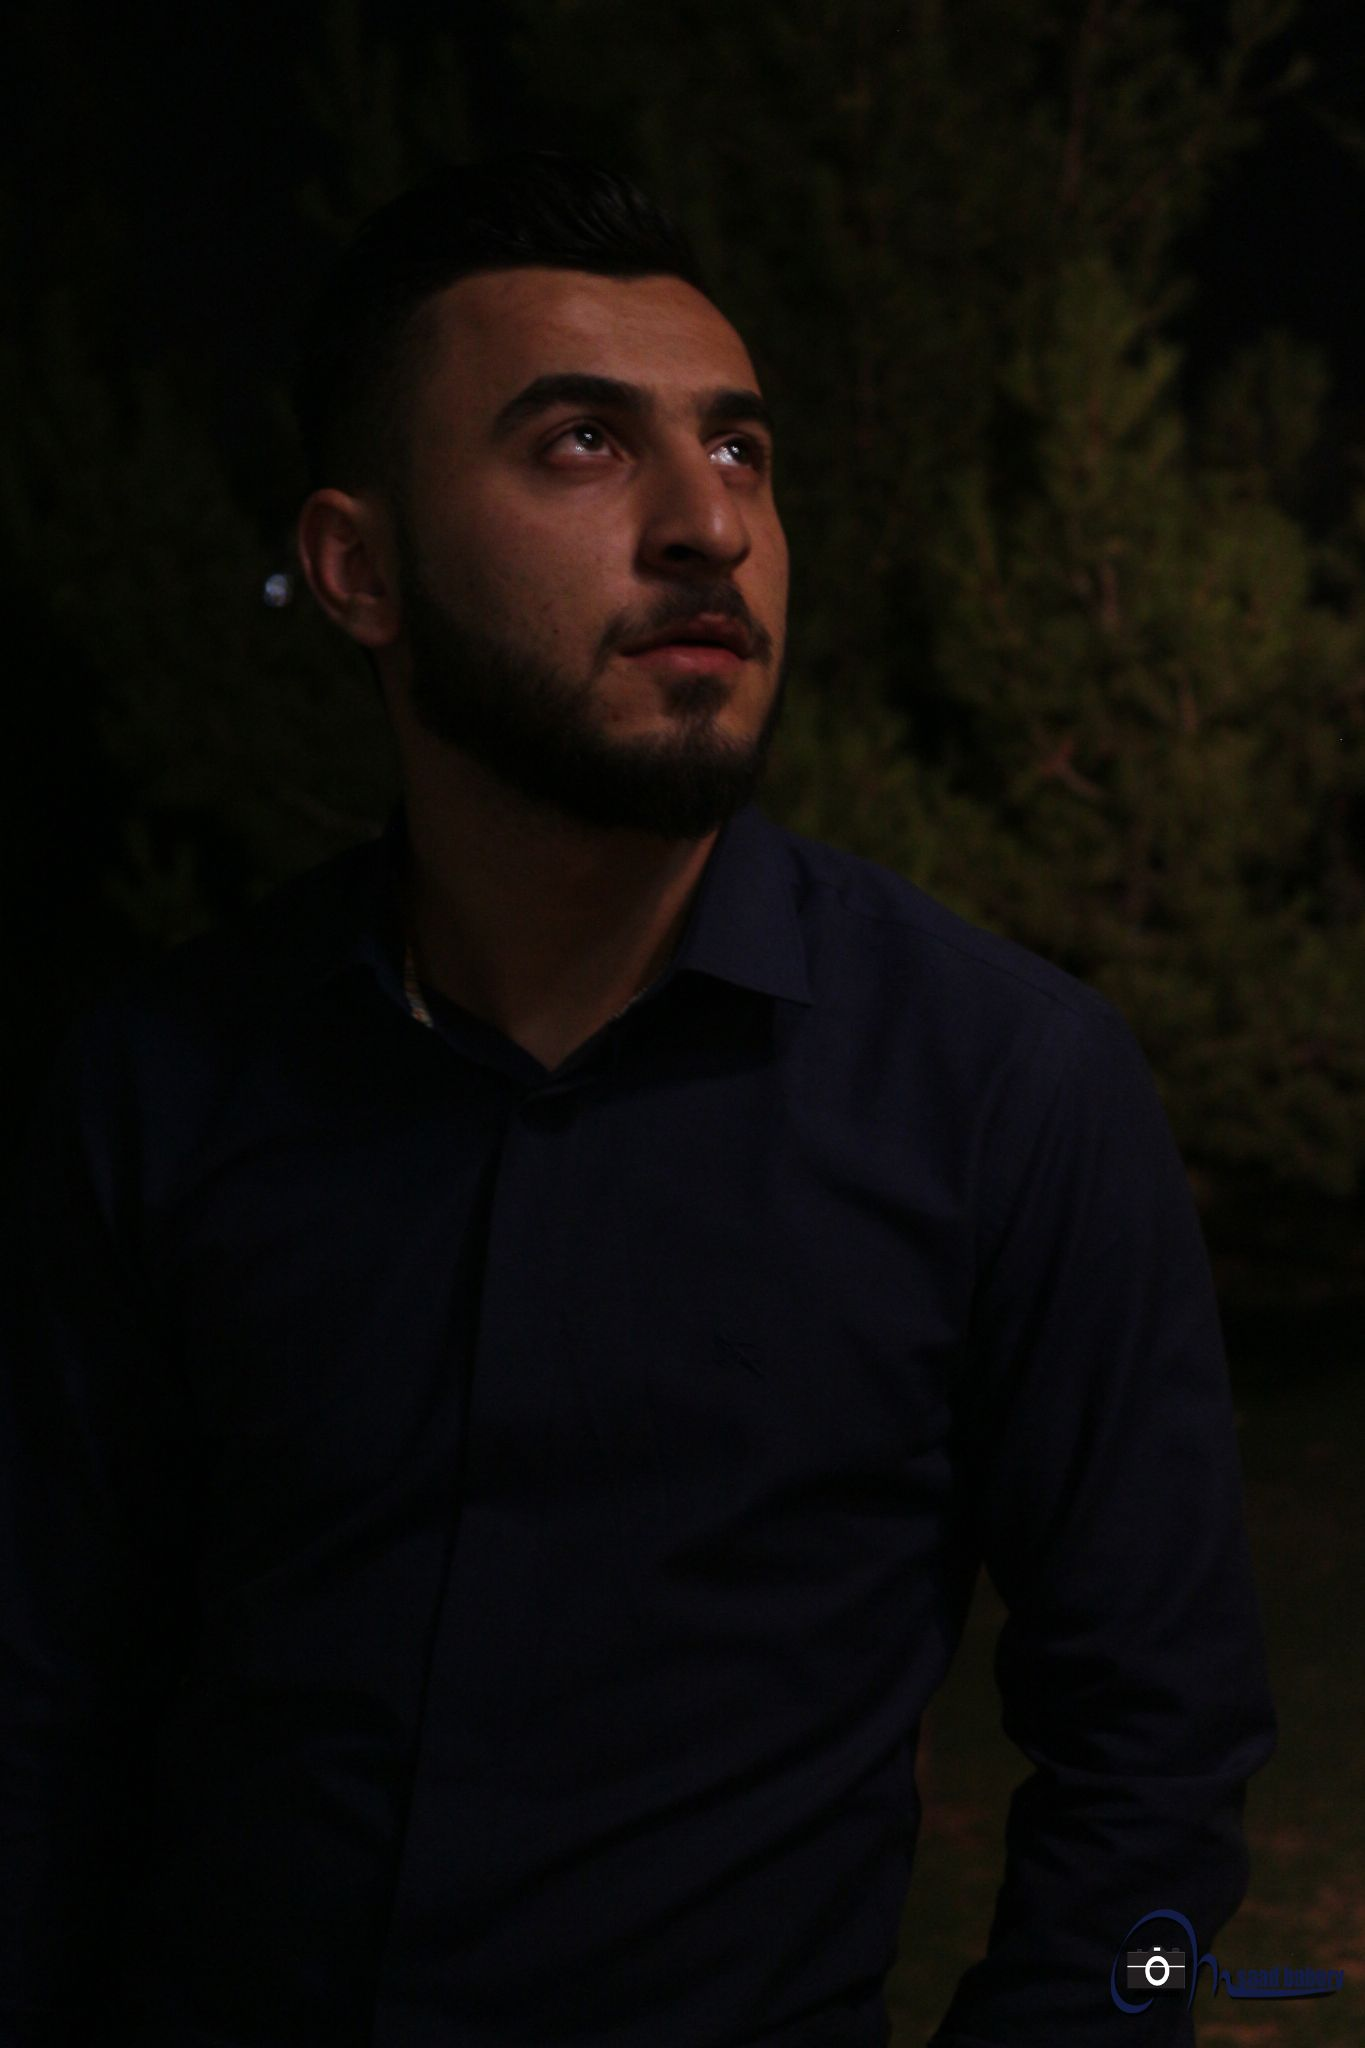 photo saad babery (172) by Saad Babery